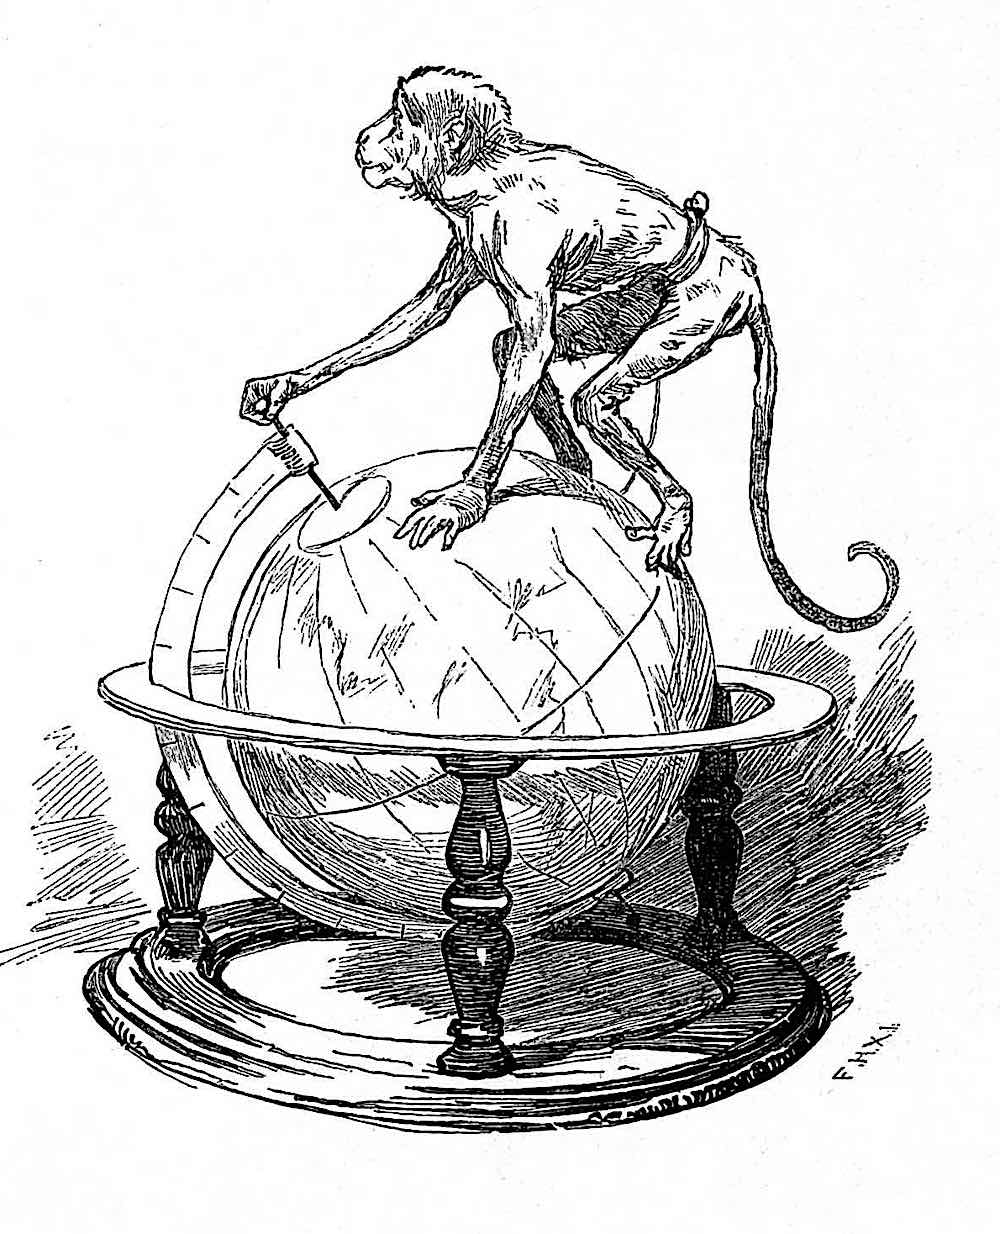 a Frederik Hendriksen 1896 illustration of a monkey on a globe